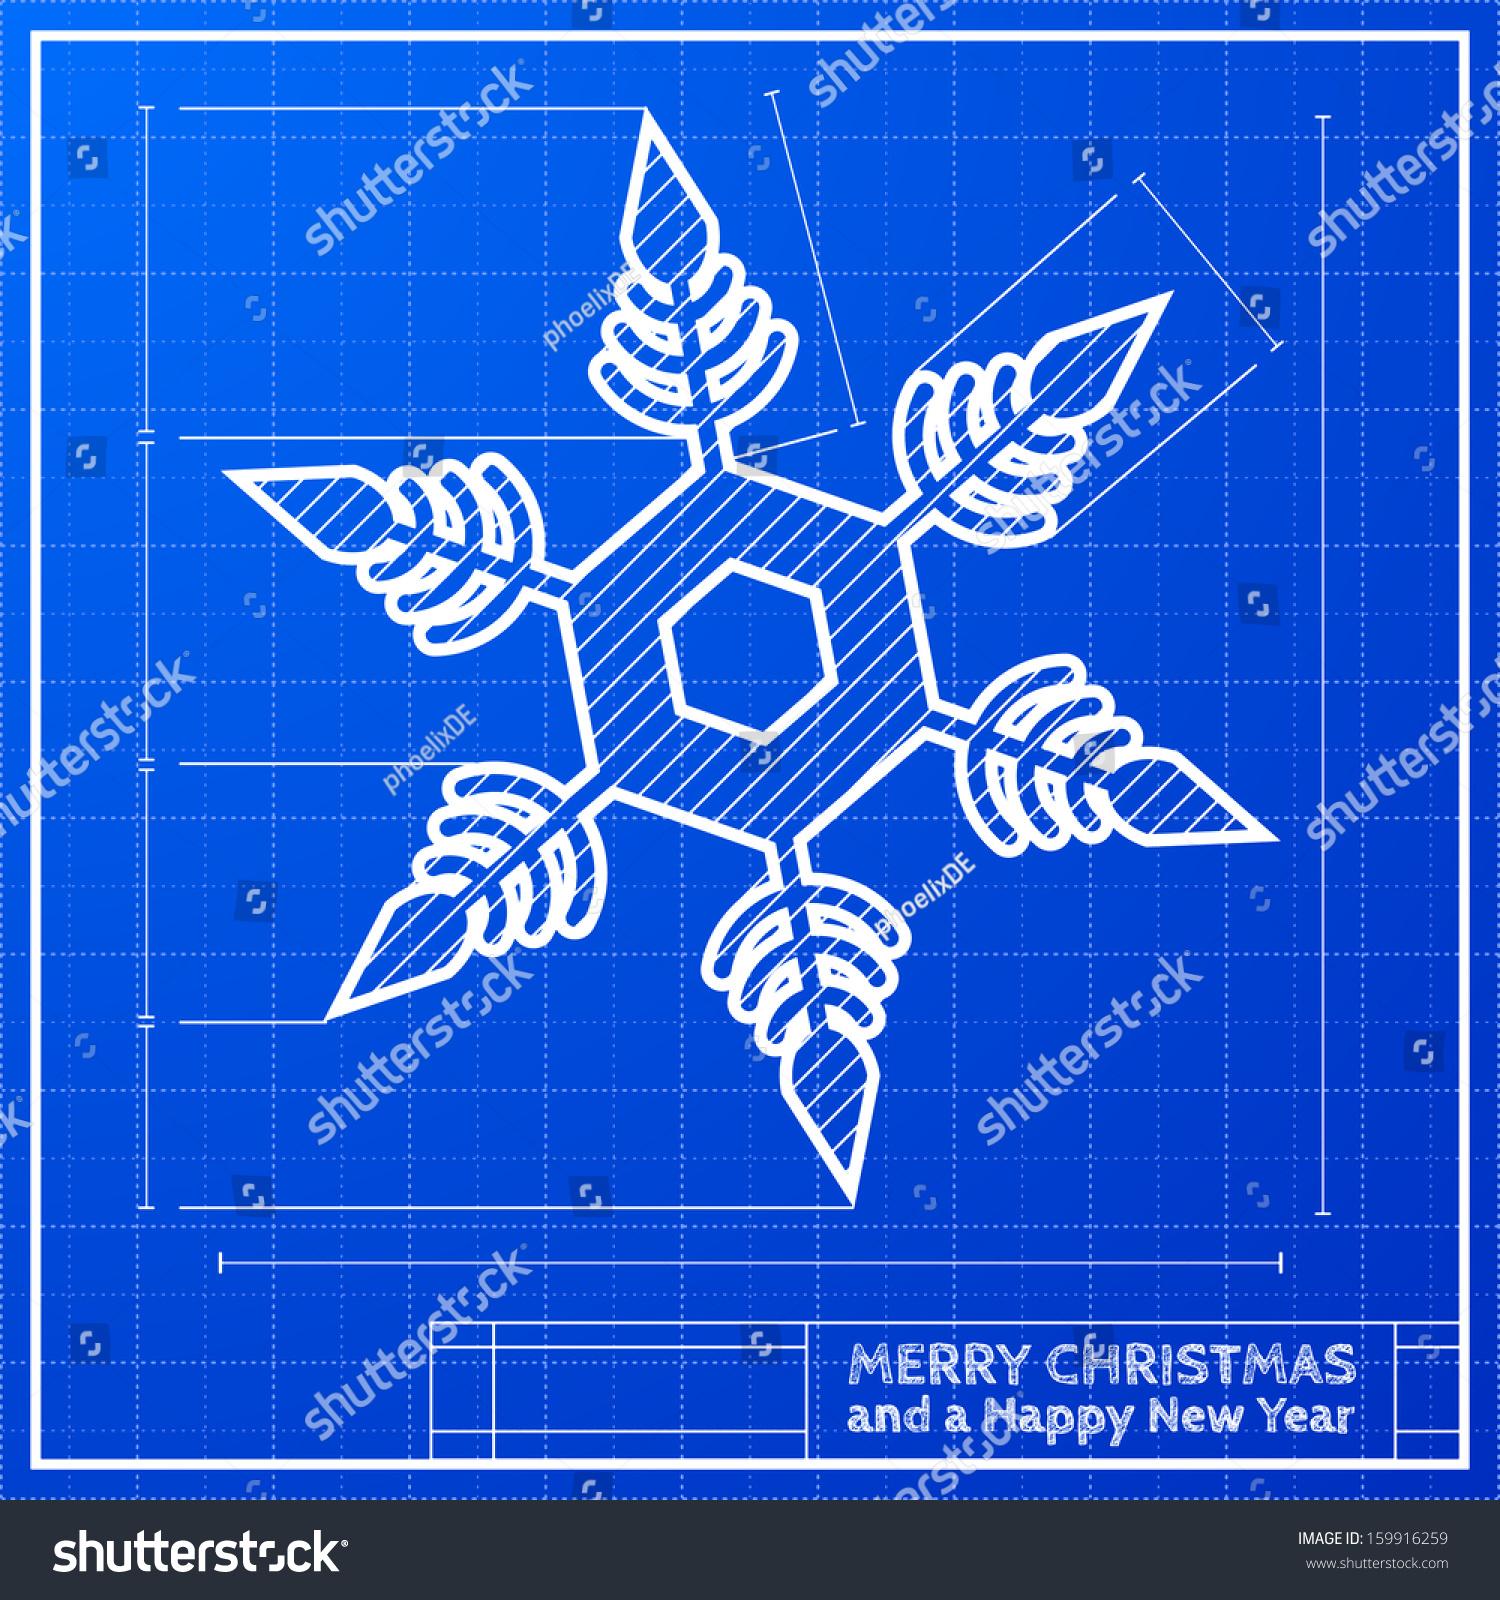 Detailed illustration snowflake on blueprint background stock detailed illustration snowflake on blueprint background stock vector 159916259 shutterstock malvernweather Gallery